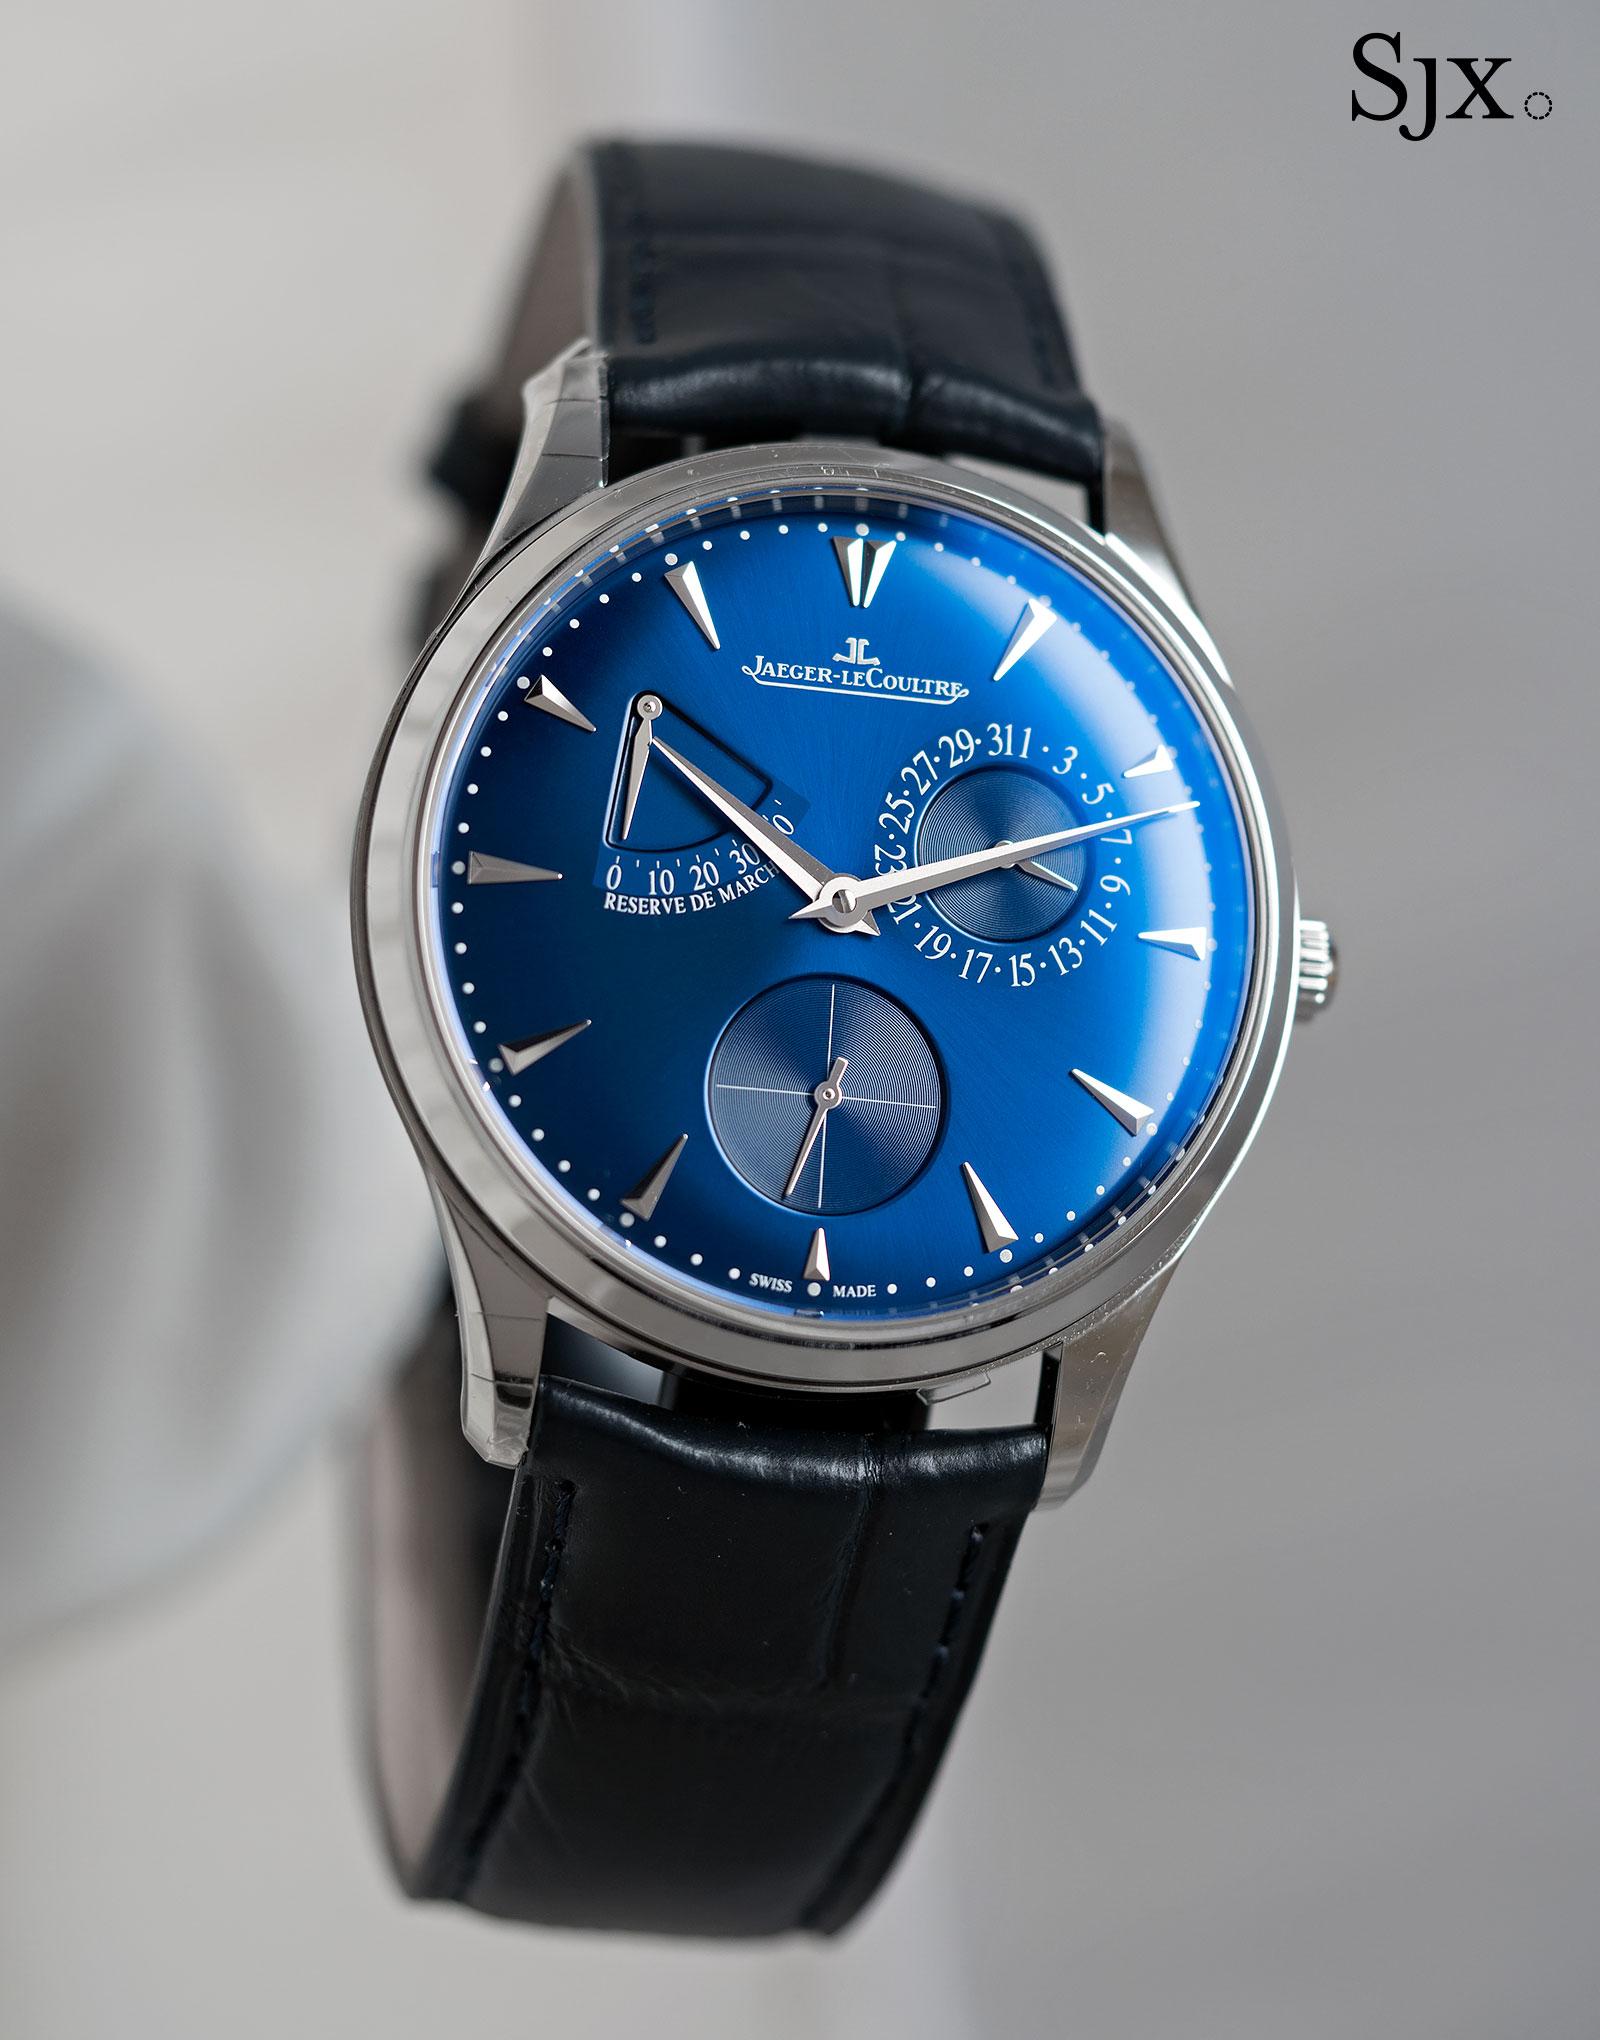 Jaeger-LeCoultre Master Ultra Thin Reserve de marche blue dial 2